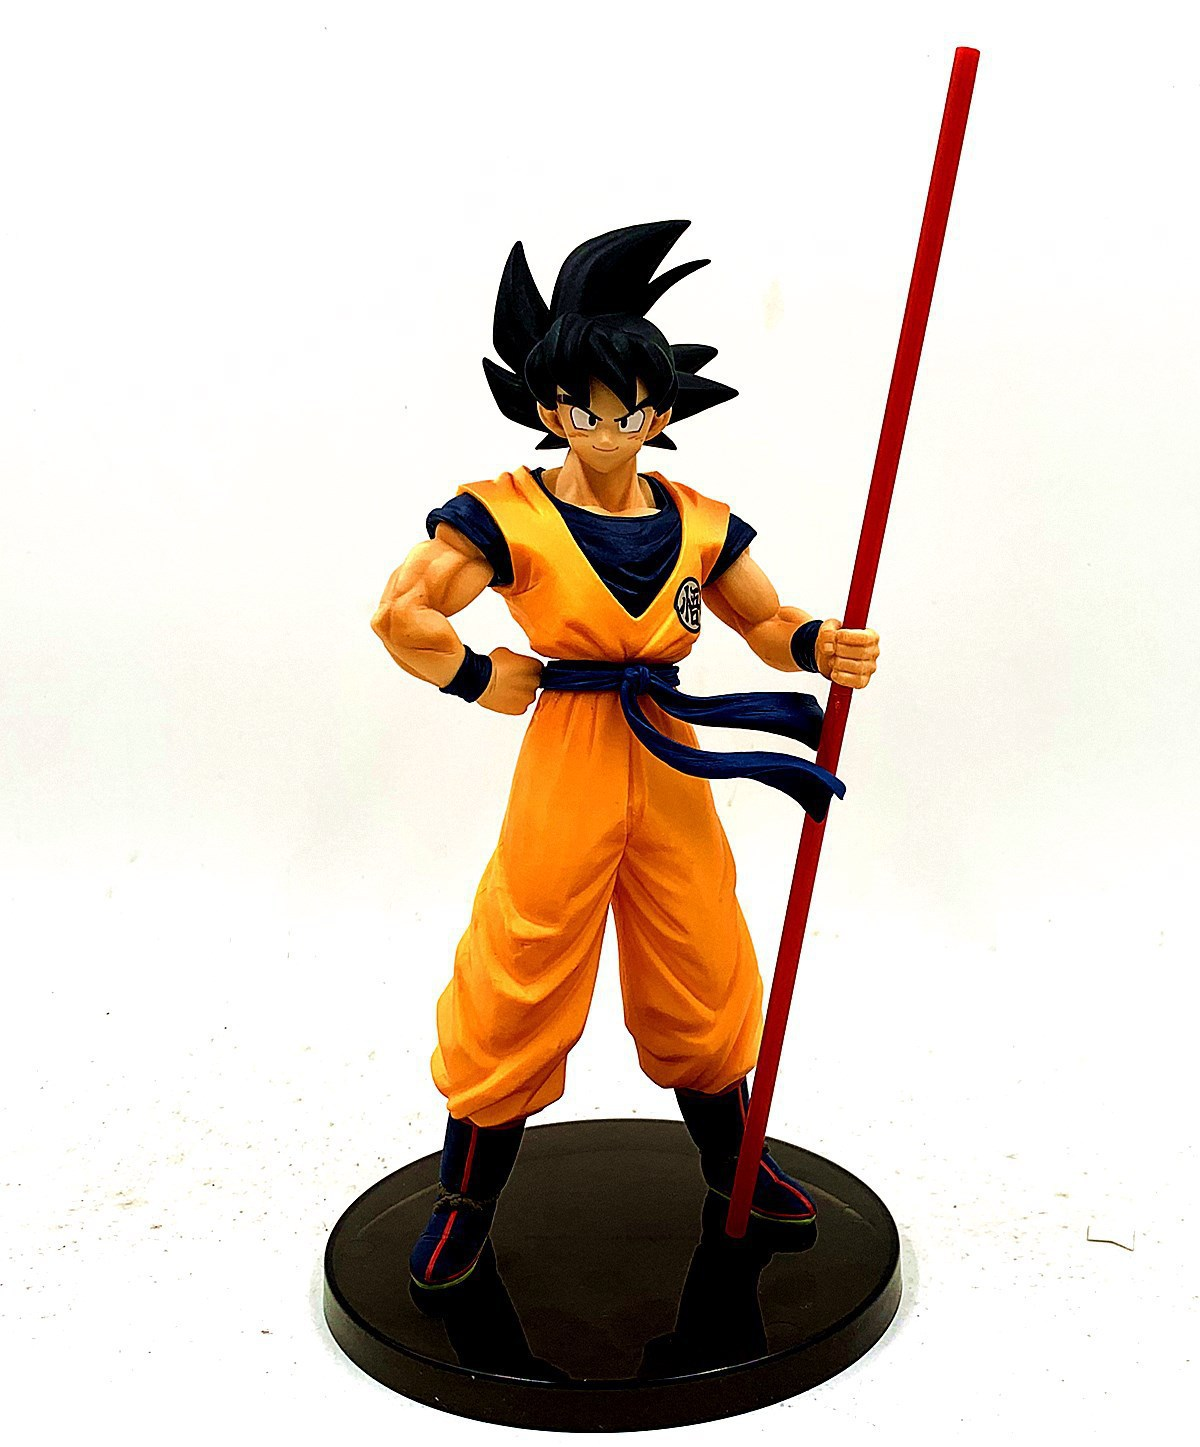 Dragon Ball Son Goku Figure The 20th Film Lmited PVC Figure New No Box 27cm